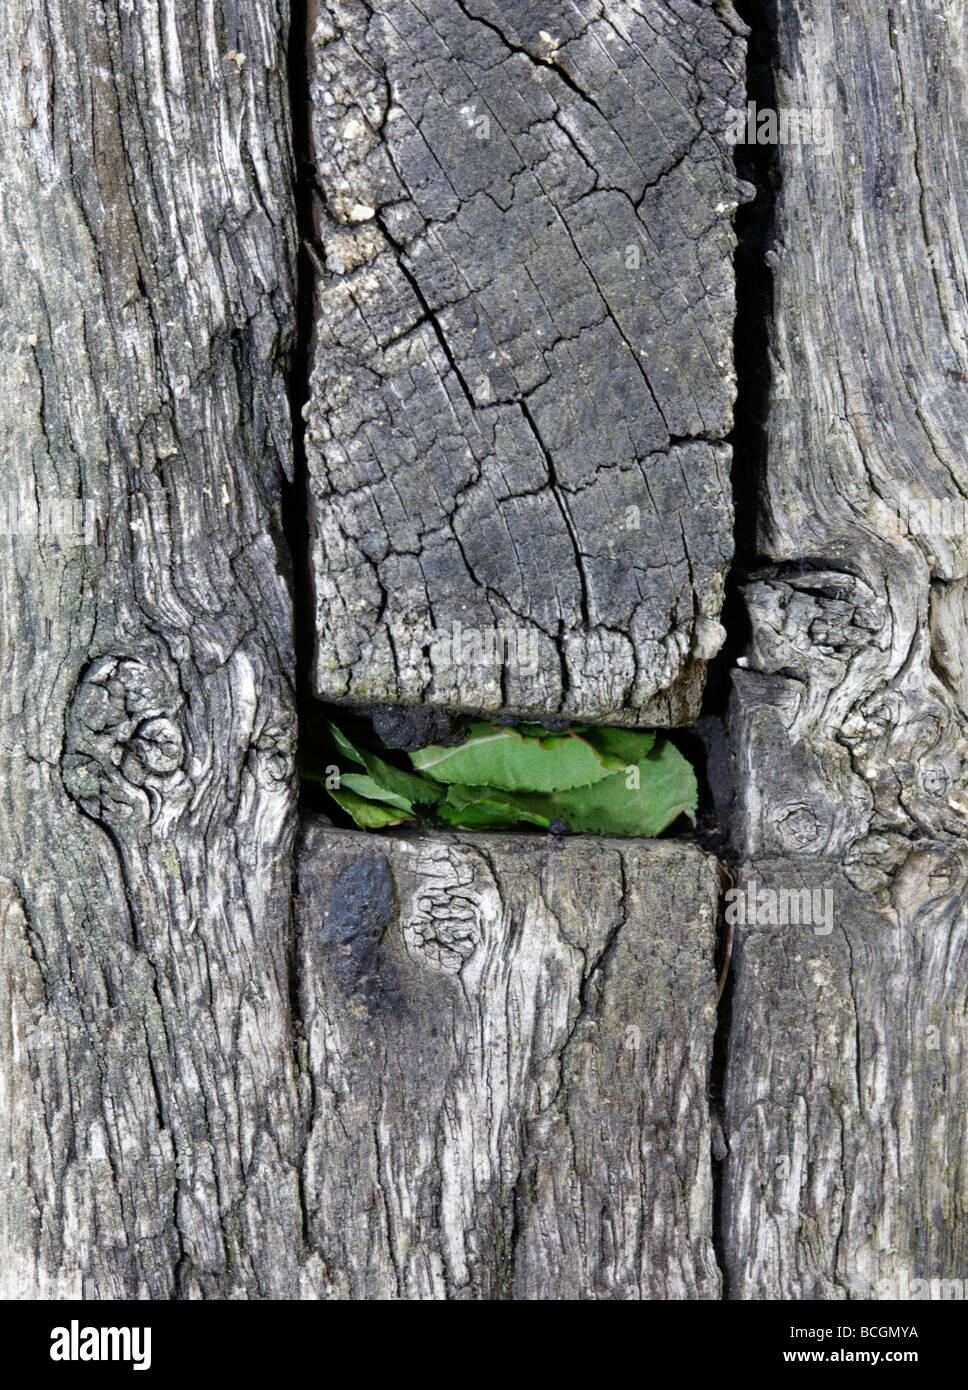 Megachile centuncularis leaf Cutter Bee nido sigillato Immagini Stock